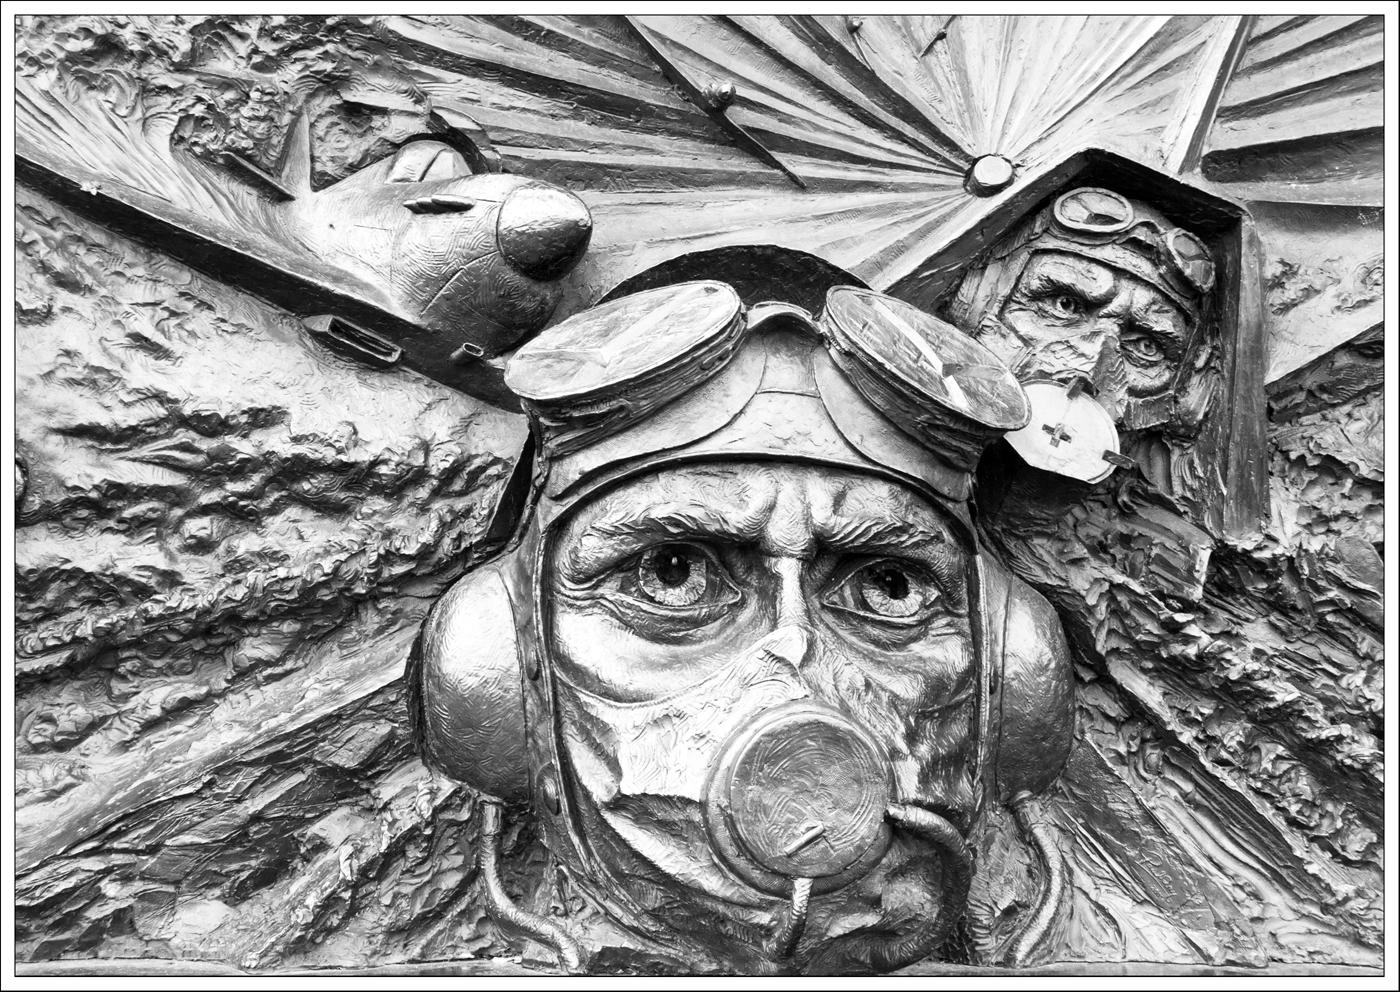 The Pilot by Betty Deshmukh LRPS